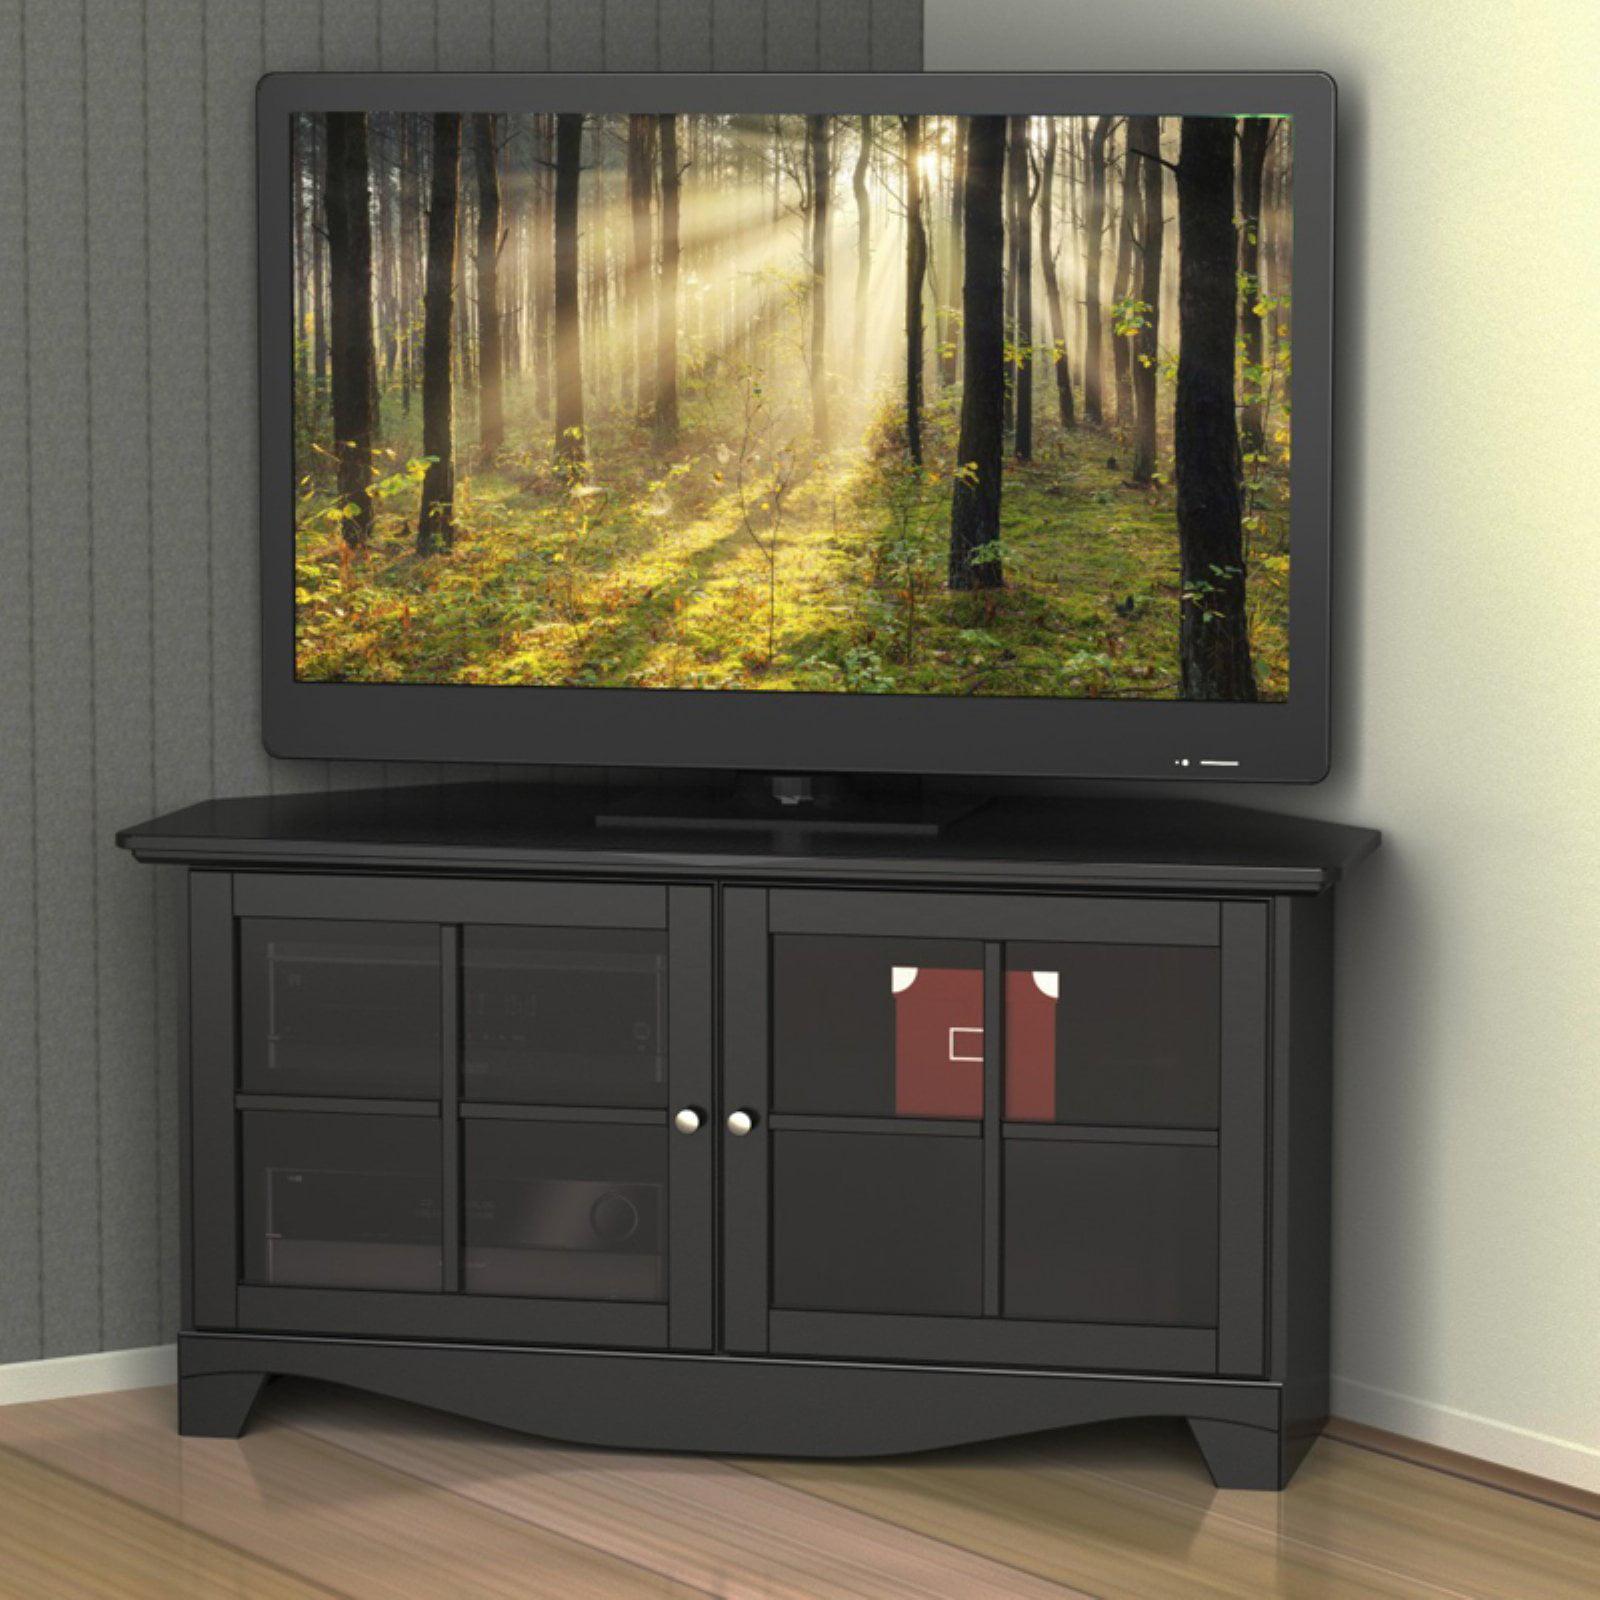 Nexera Pinnacle Black 2-Door Corner TV Stand for TVs up to 49